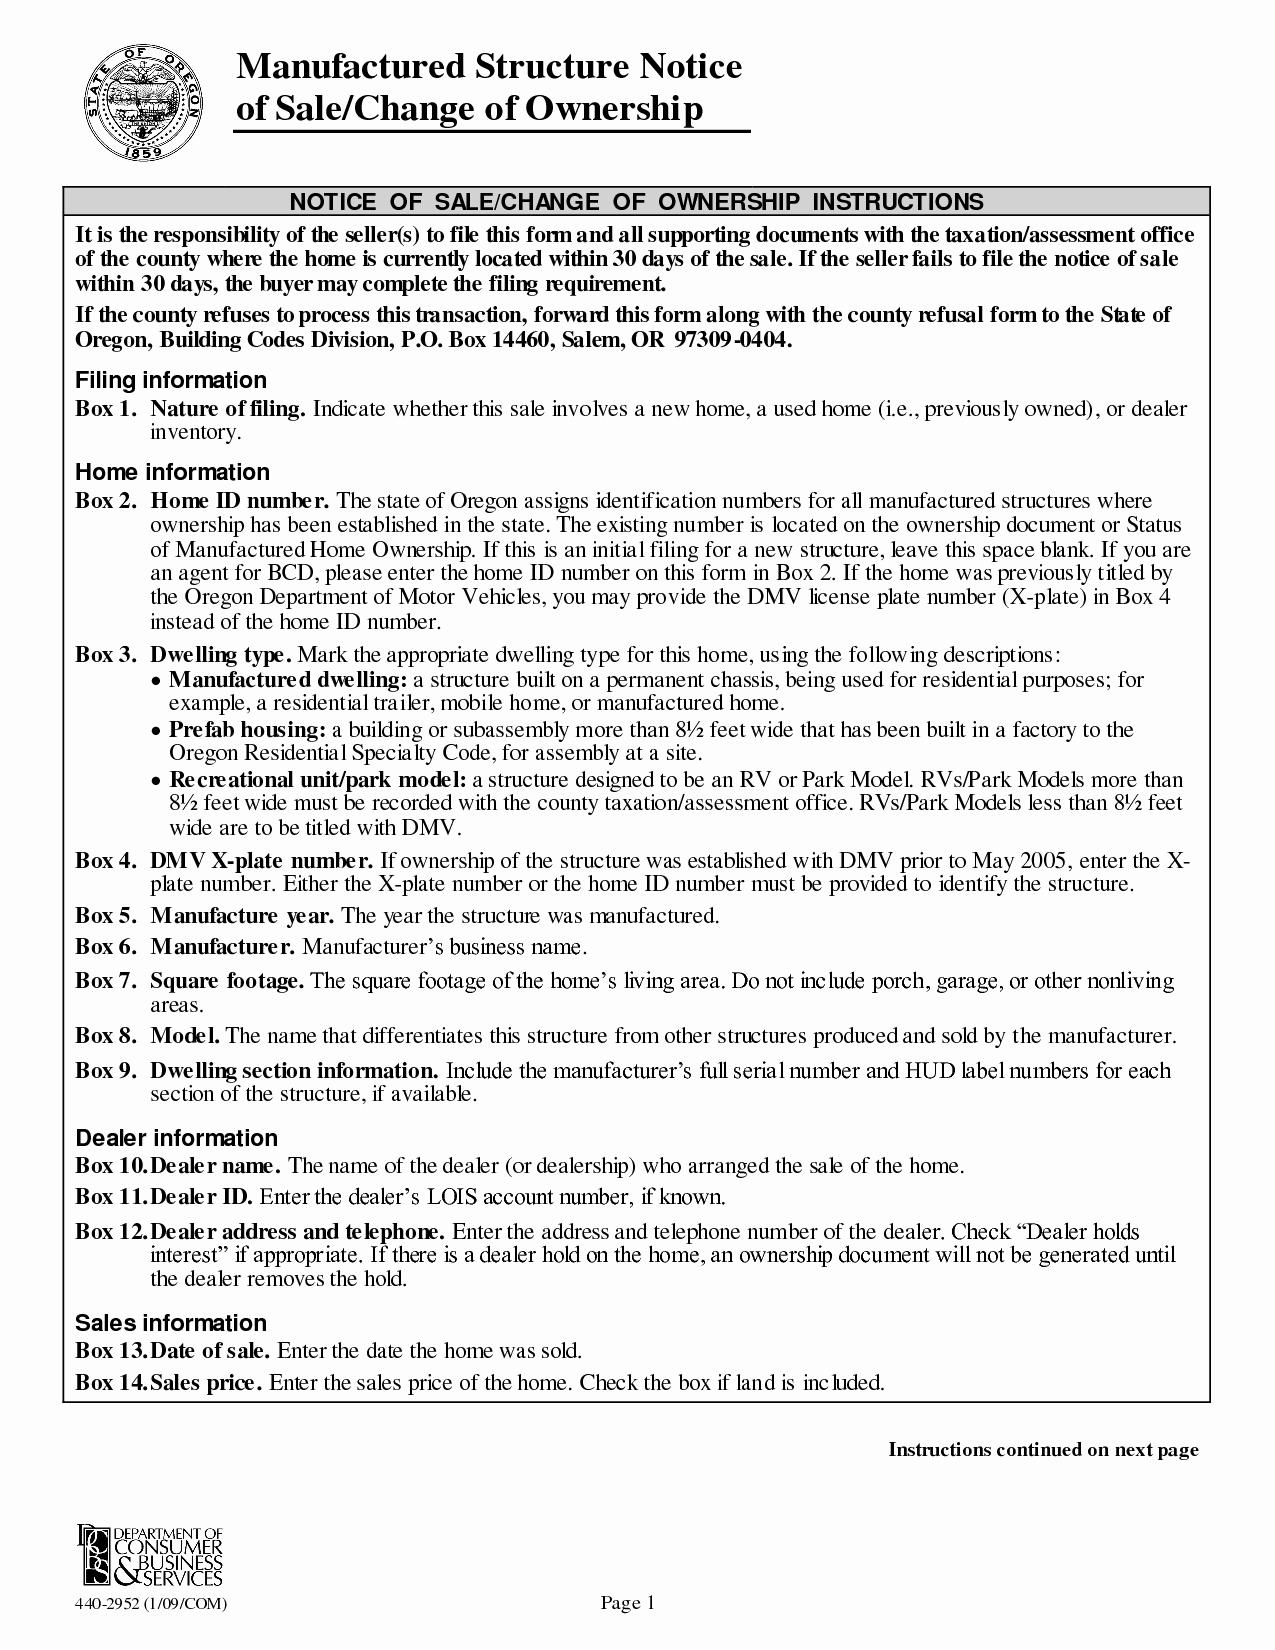 Camper Bill Of Sale Lovely Free Printable Bill Of Sale Camper form Generic